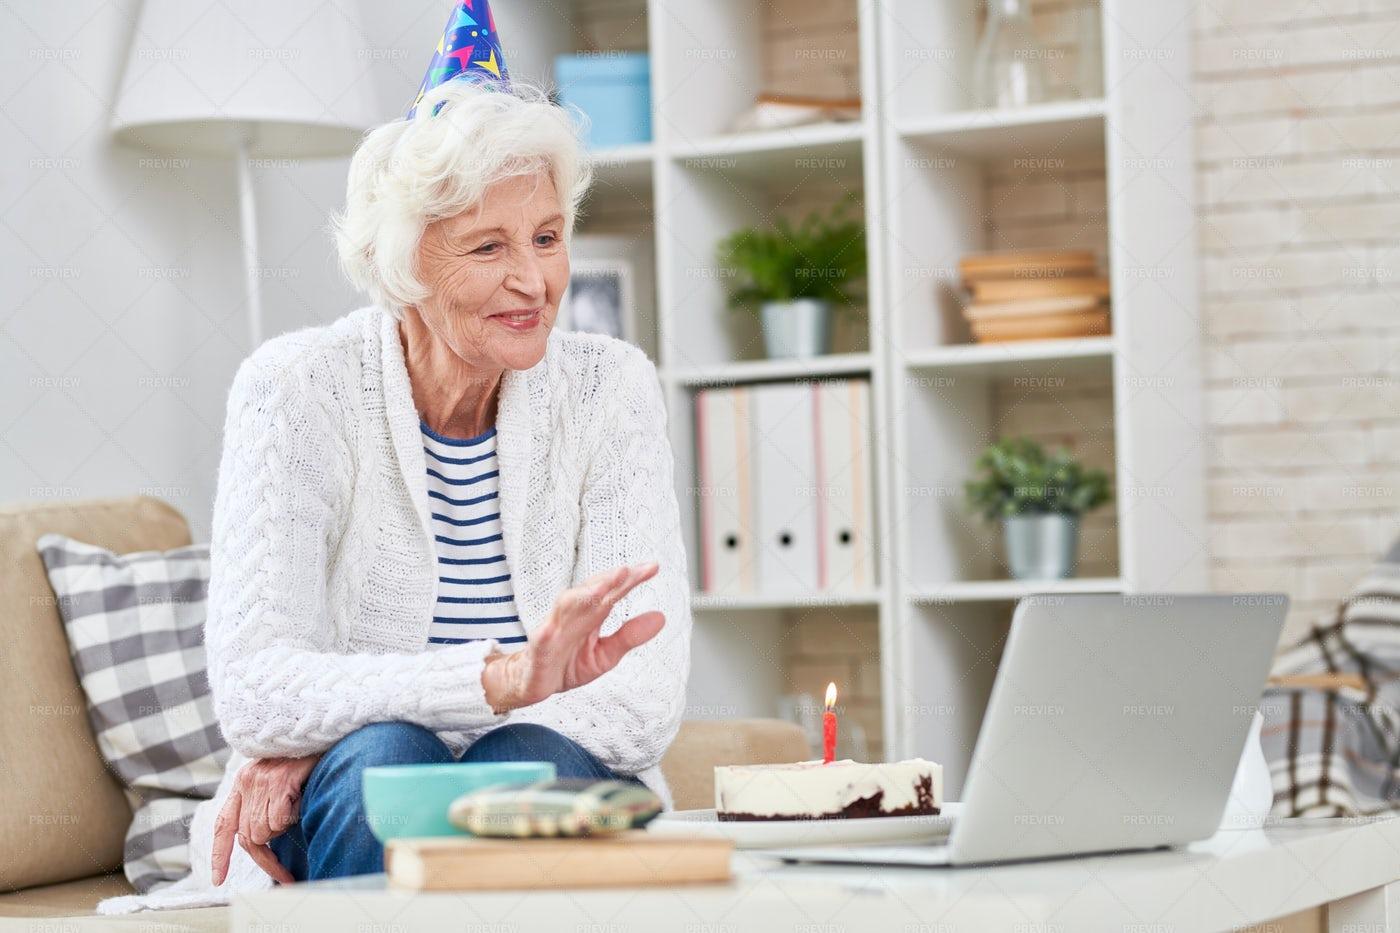 Happy Senior Birthday Woman Talking...: Stock Photos